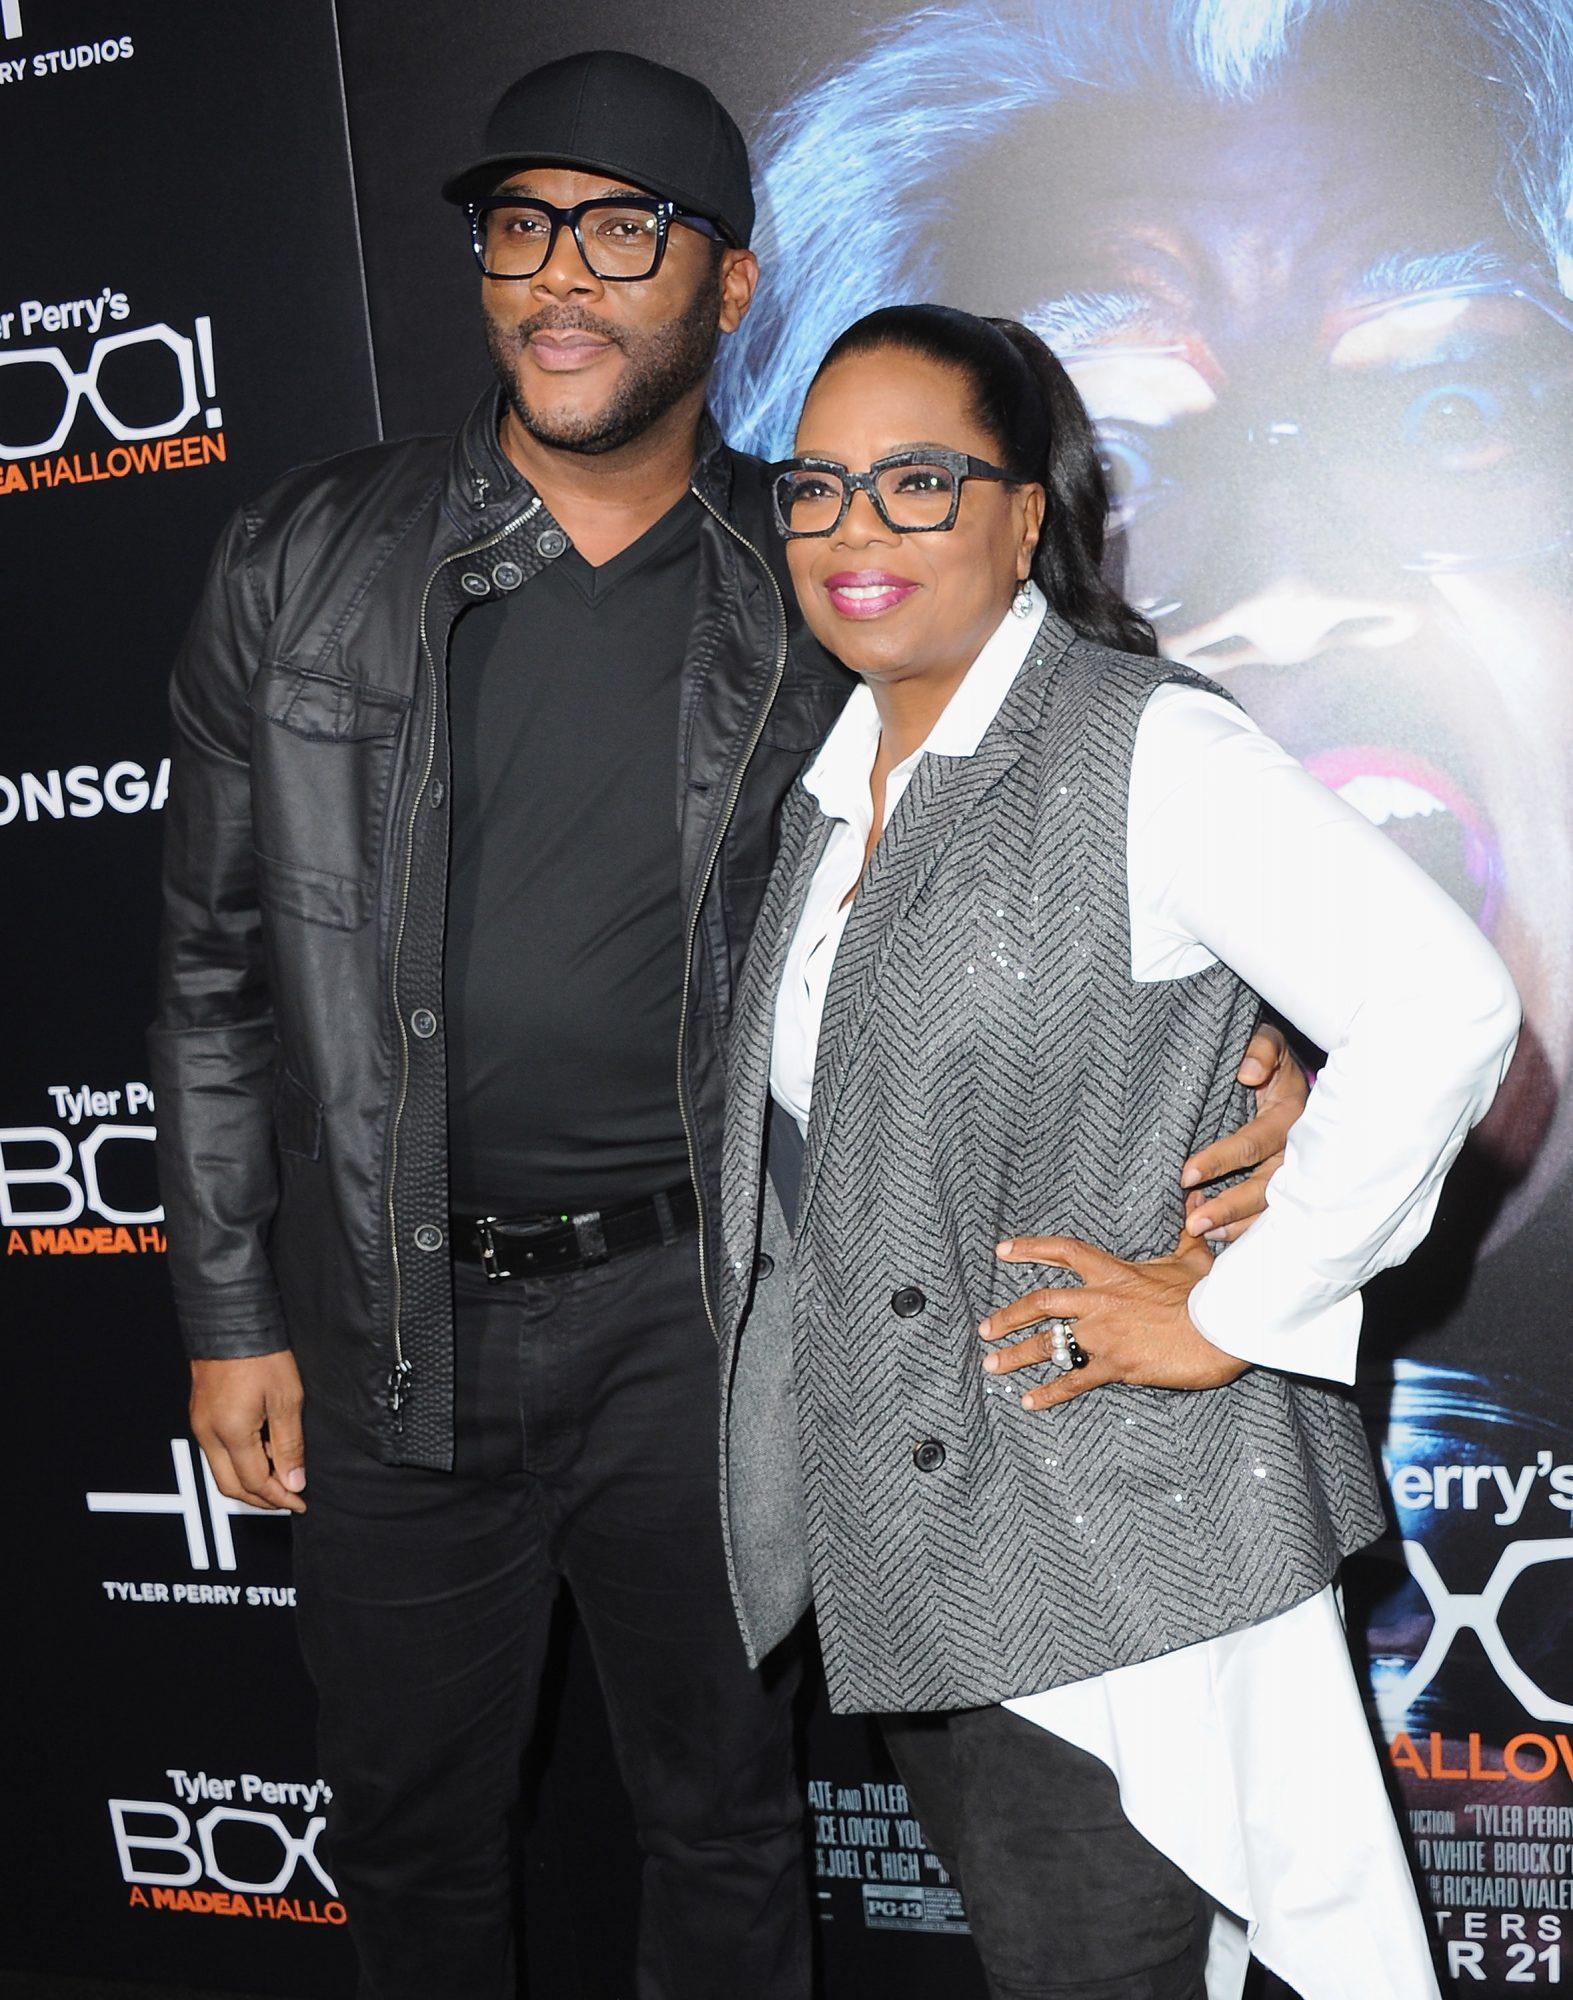 Tyler Perry y Oprah Winfrey